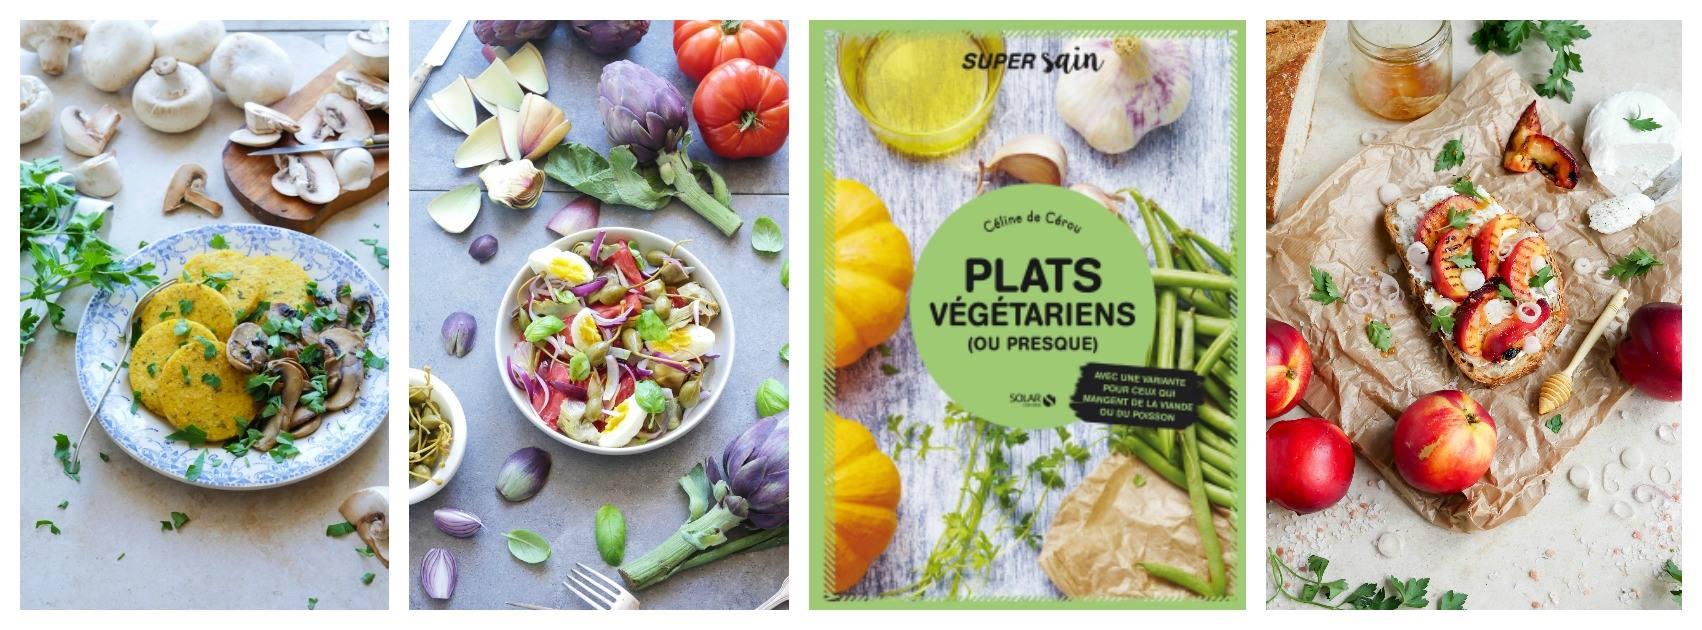 livre plats vegetarien ou presque